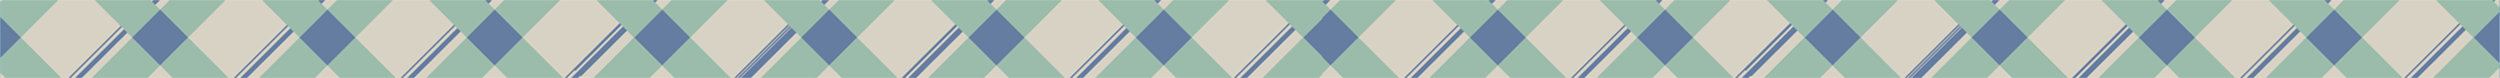 R&F_Bag_Designs_nokeyline_Sample_22-thin.jpg